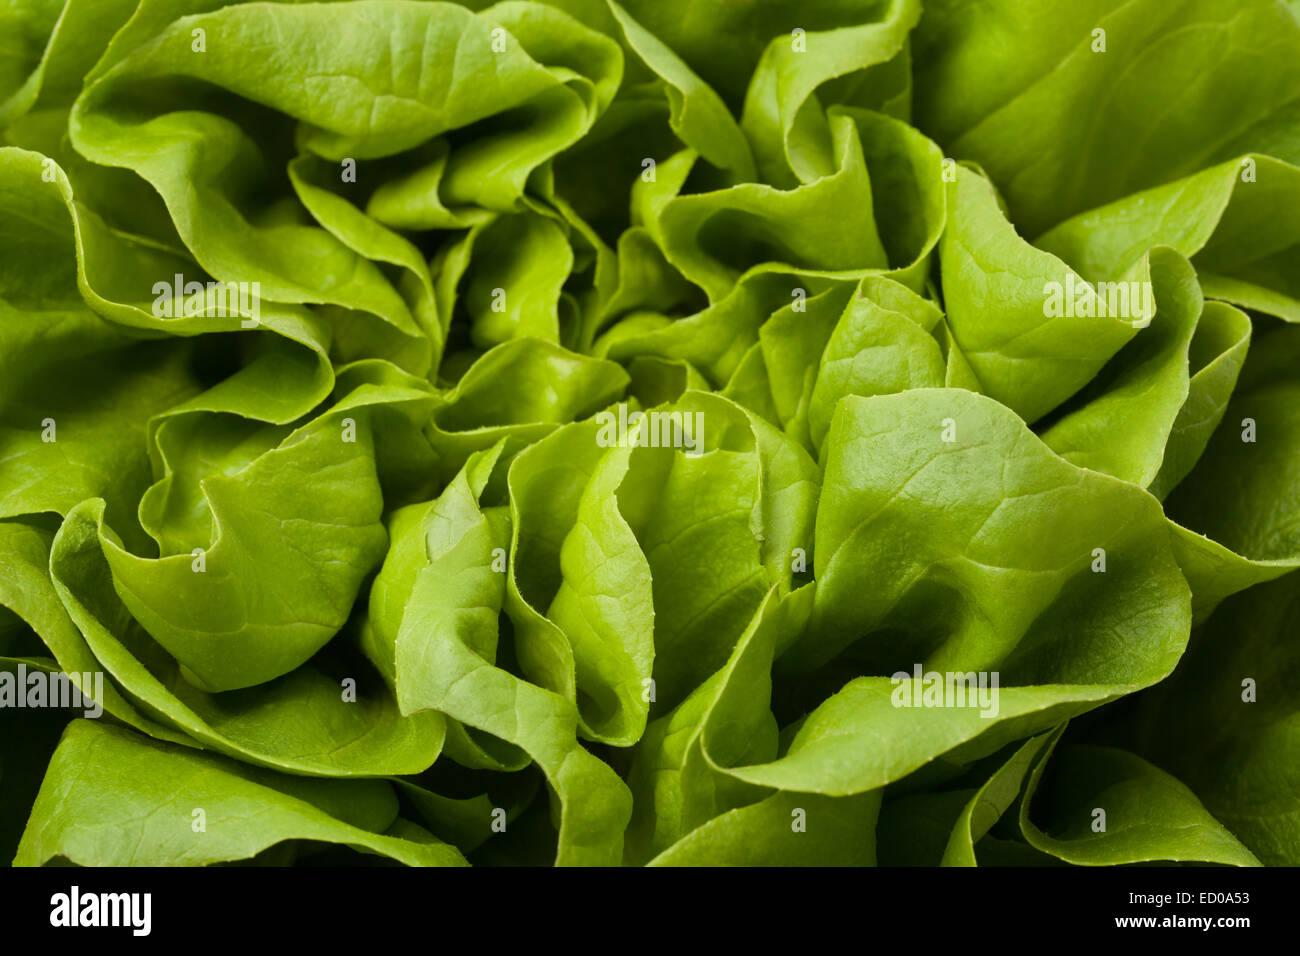 Pictire of fresh, raw, green lettuce closeup. - Stock Image